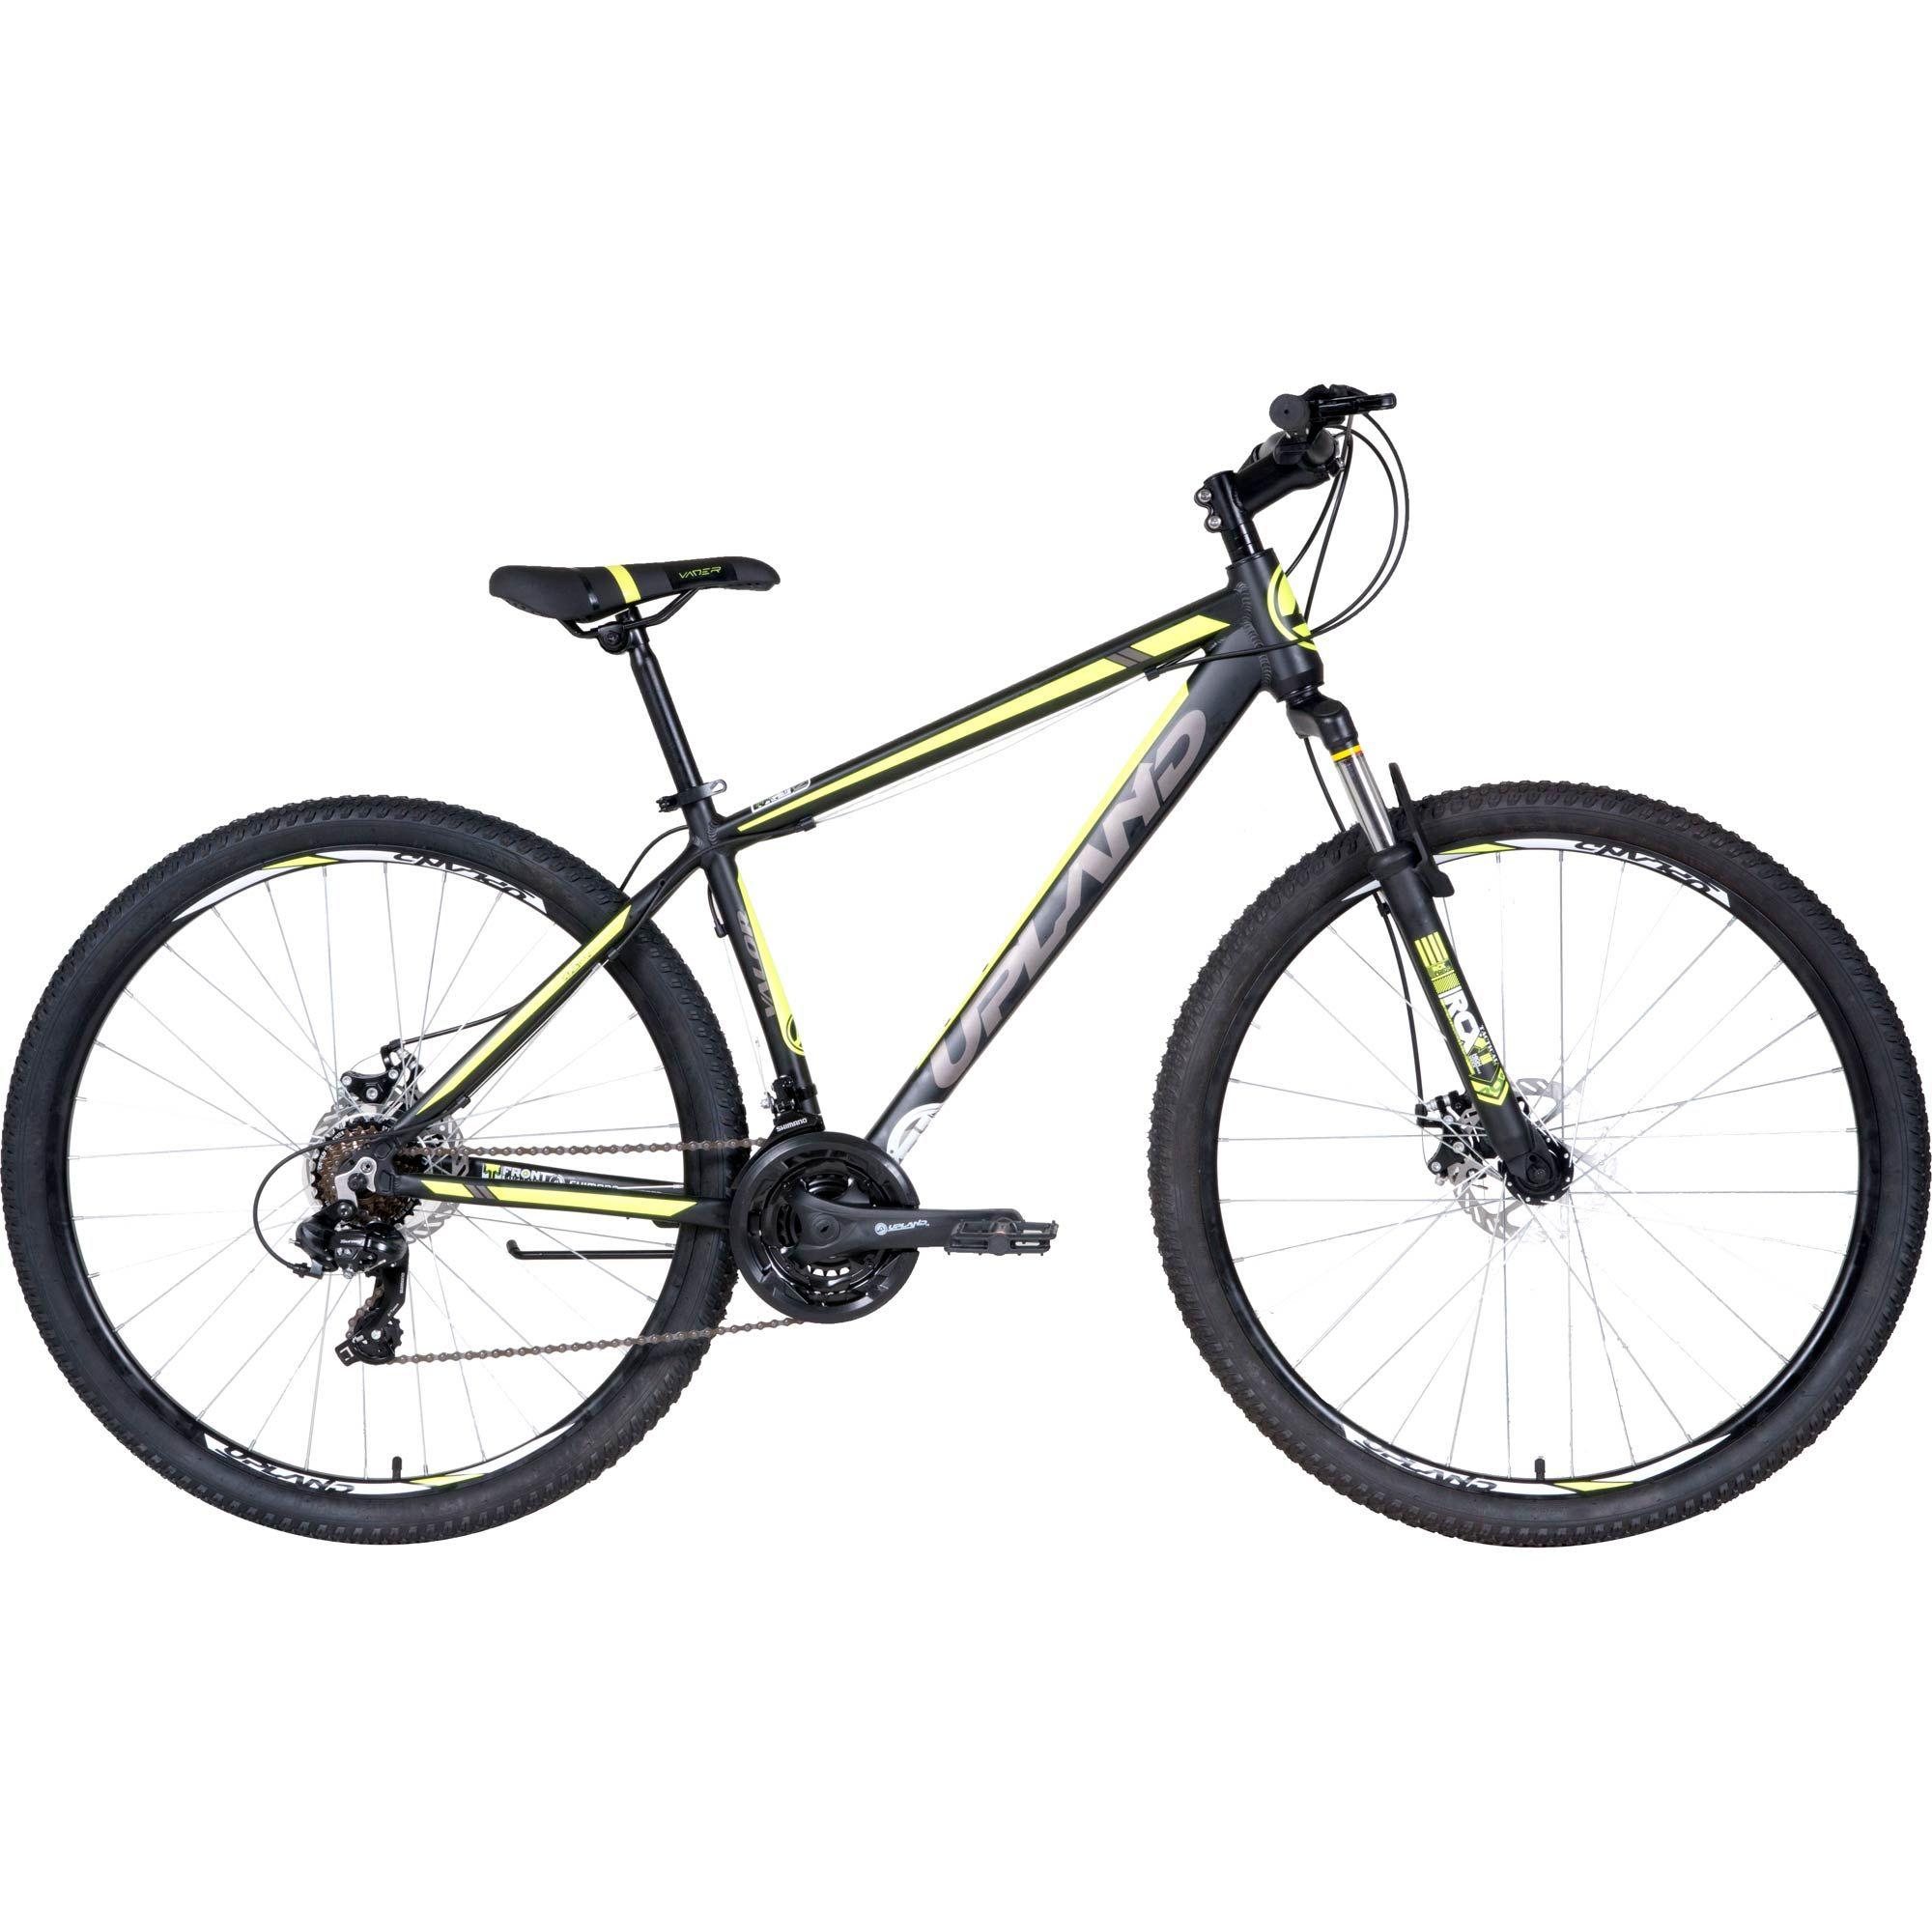 UpLand Men's Valor 29 in. Mountain Bike Mountain biking